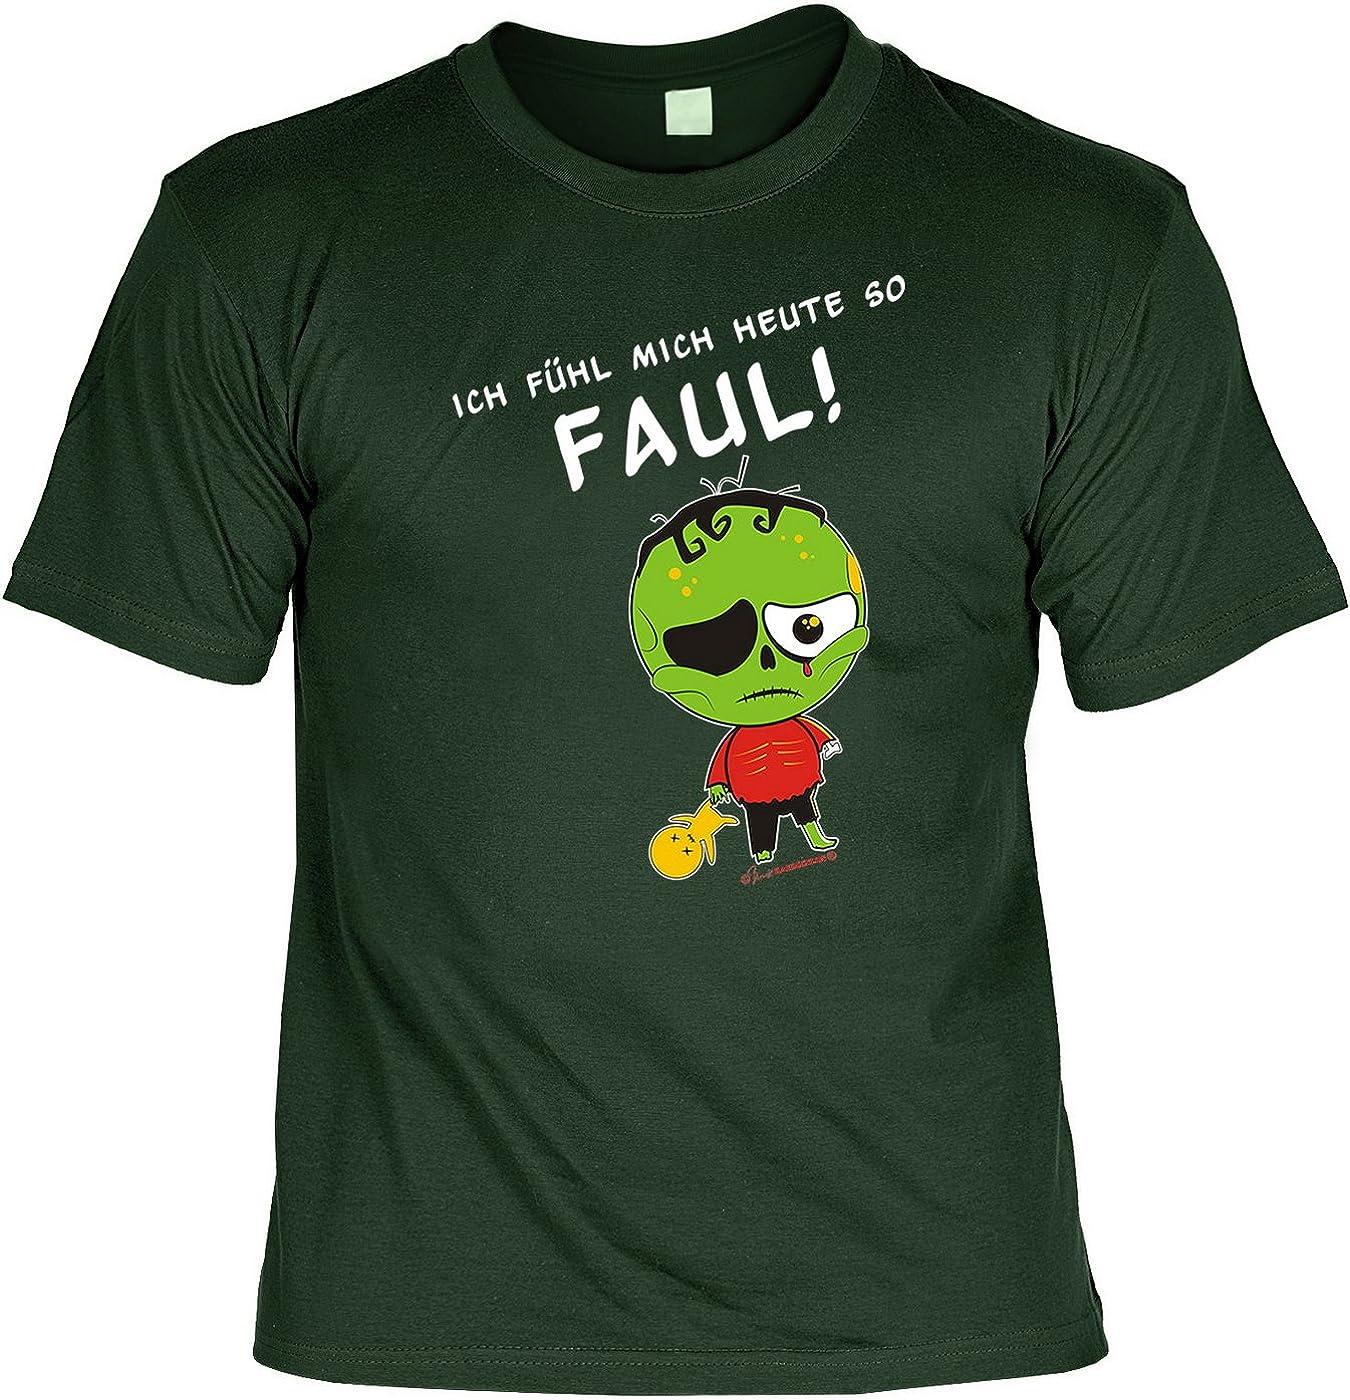 Ich Fühl Mich Heute so Faul Sprüche Fun T-Shirt - mit